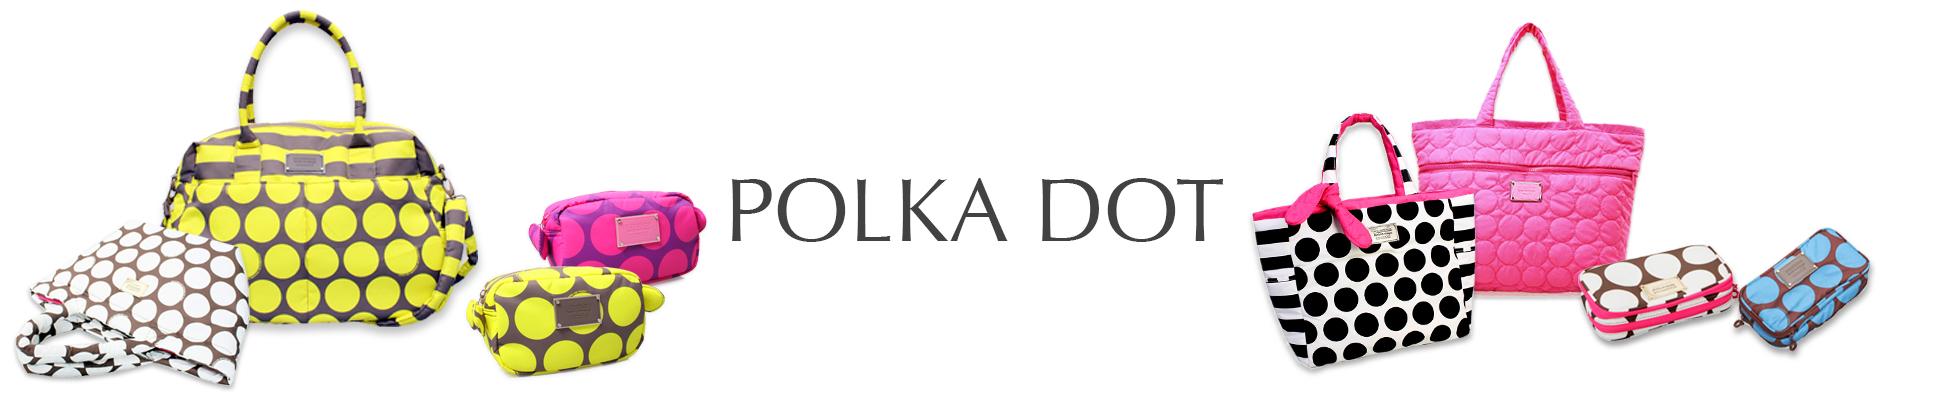 polka.jpg